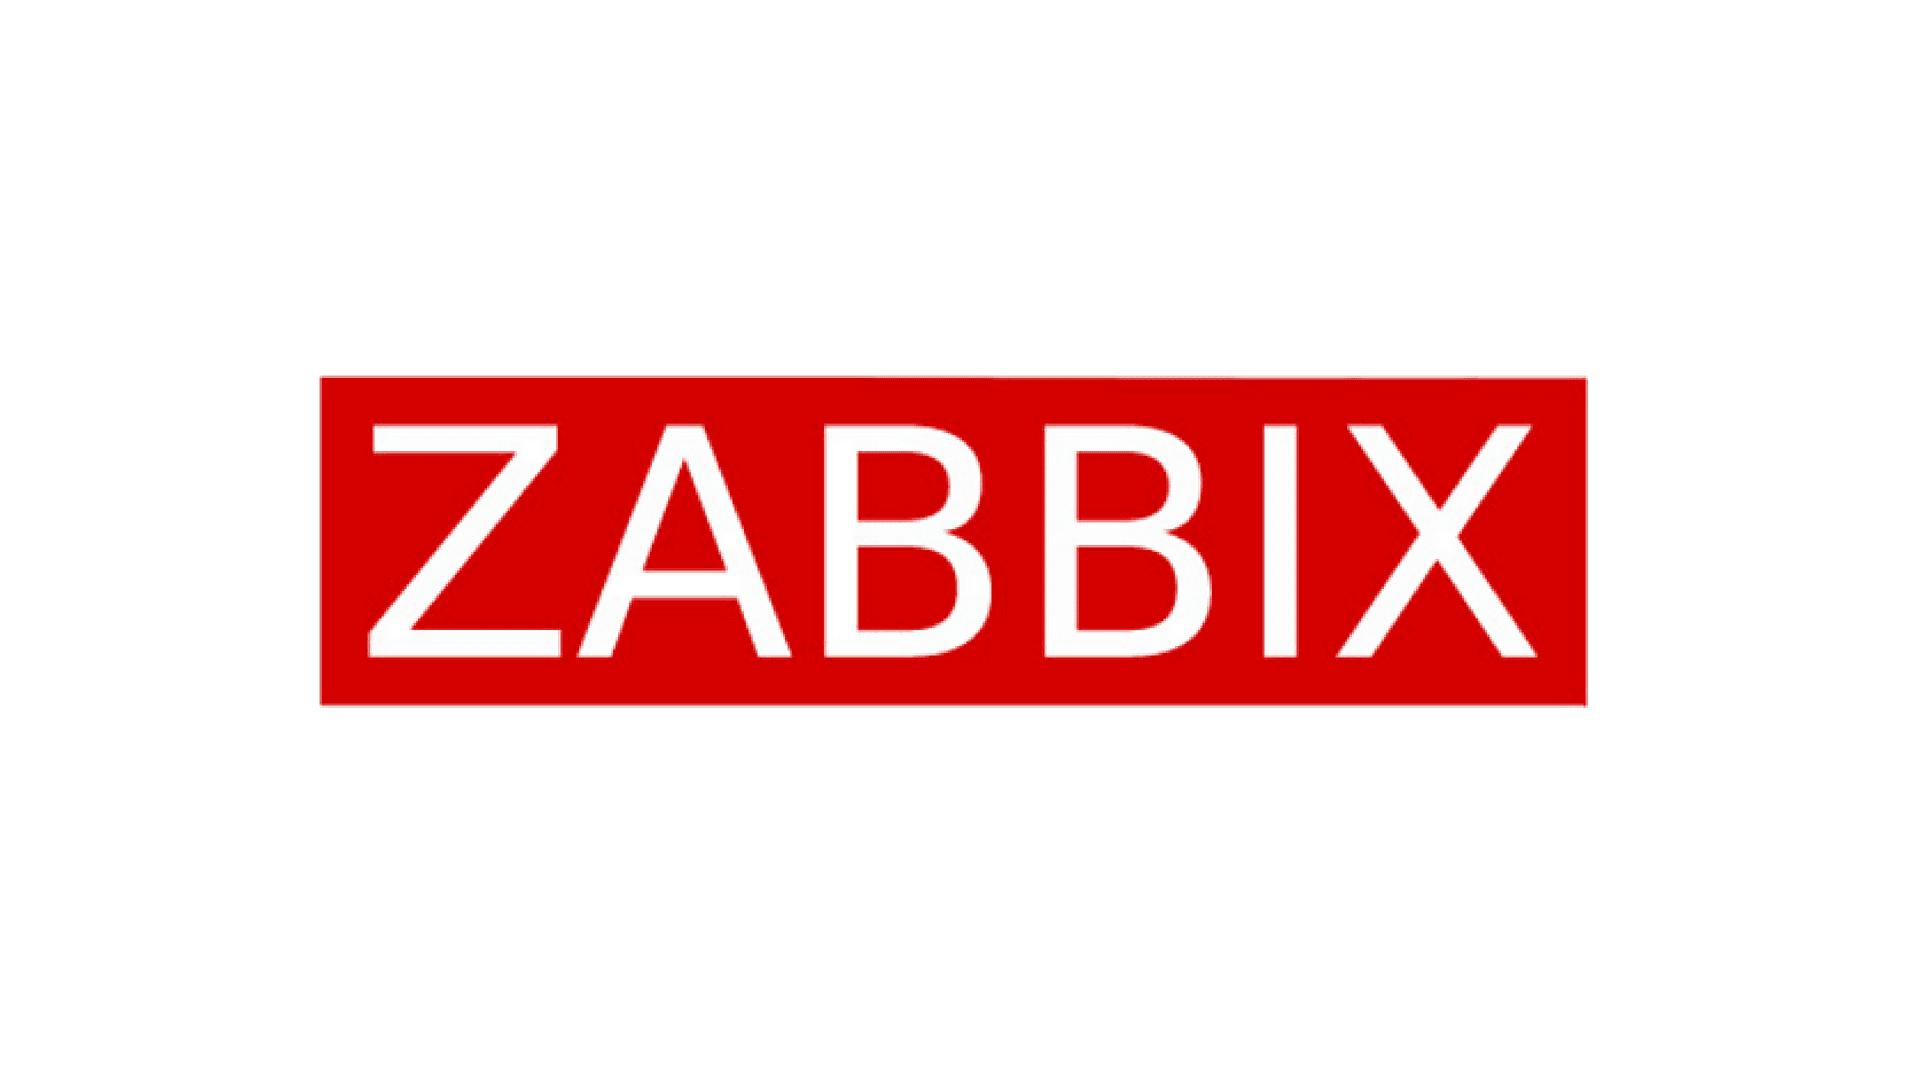 How install and configure ZABBIX on CentOS?